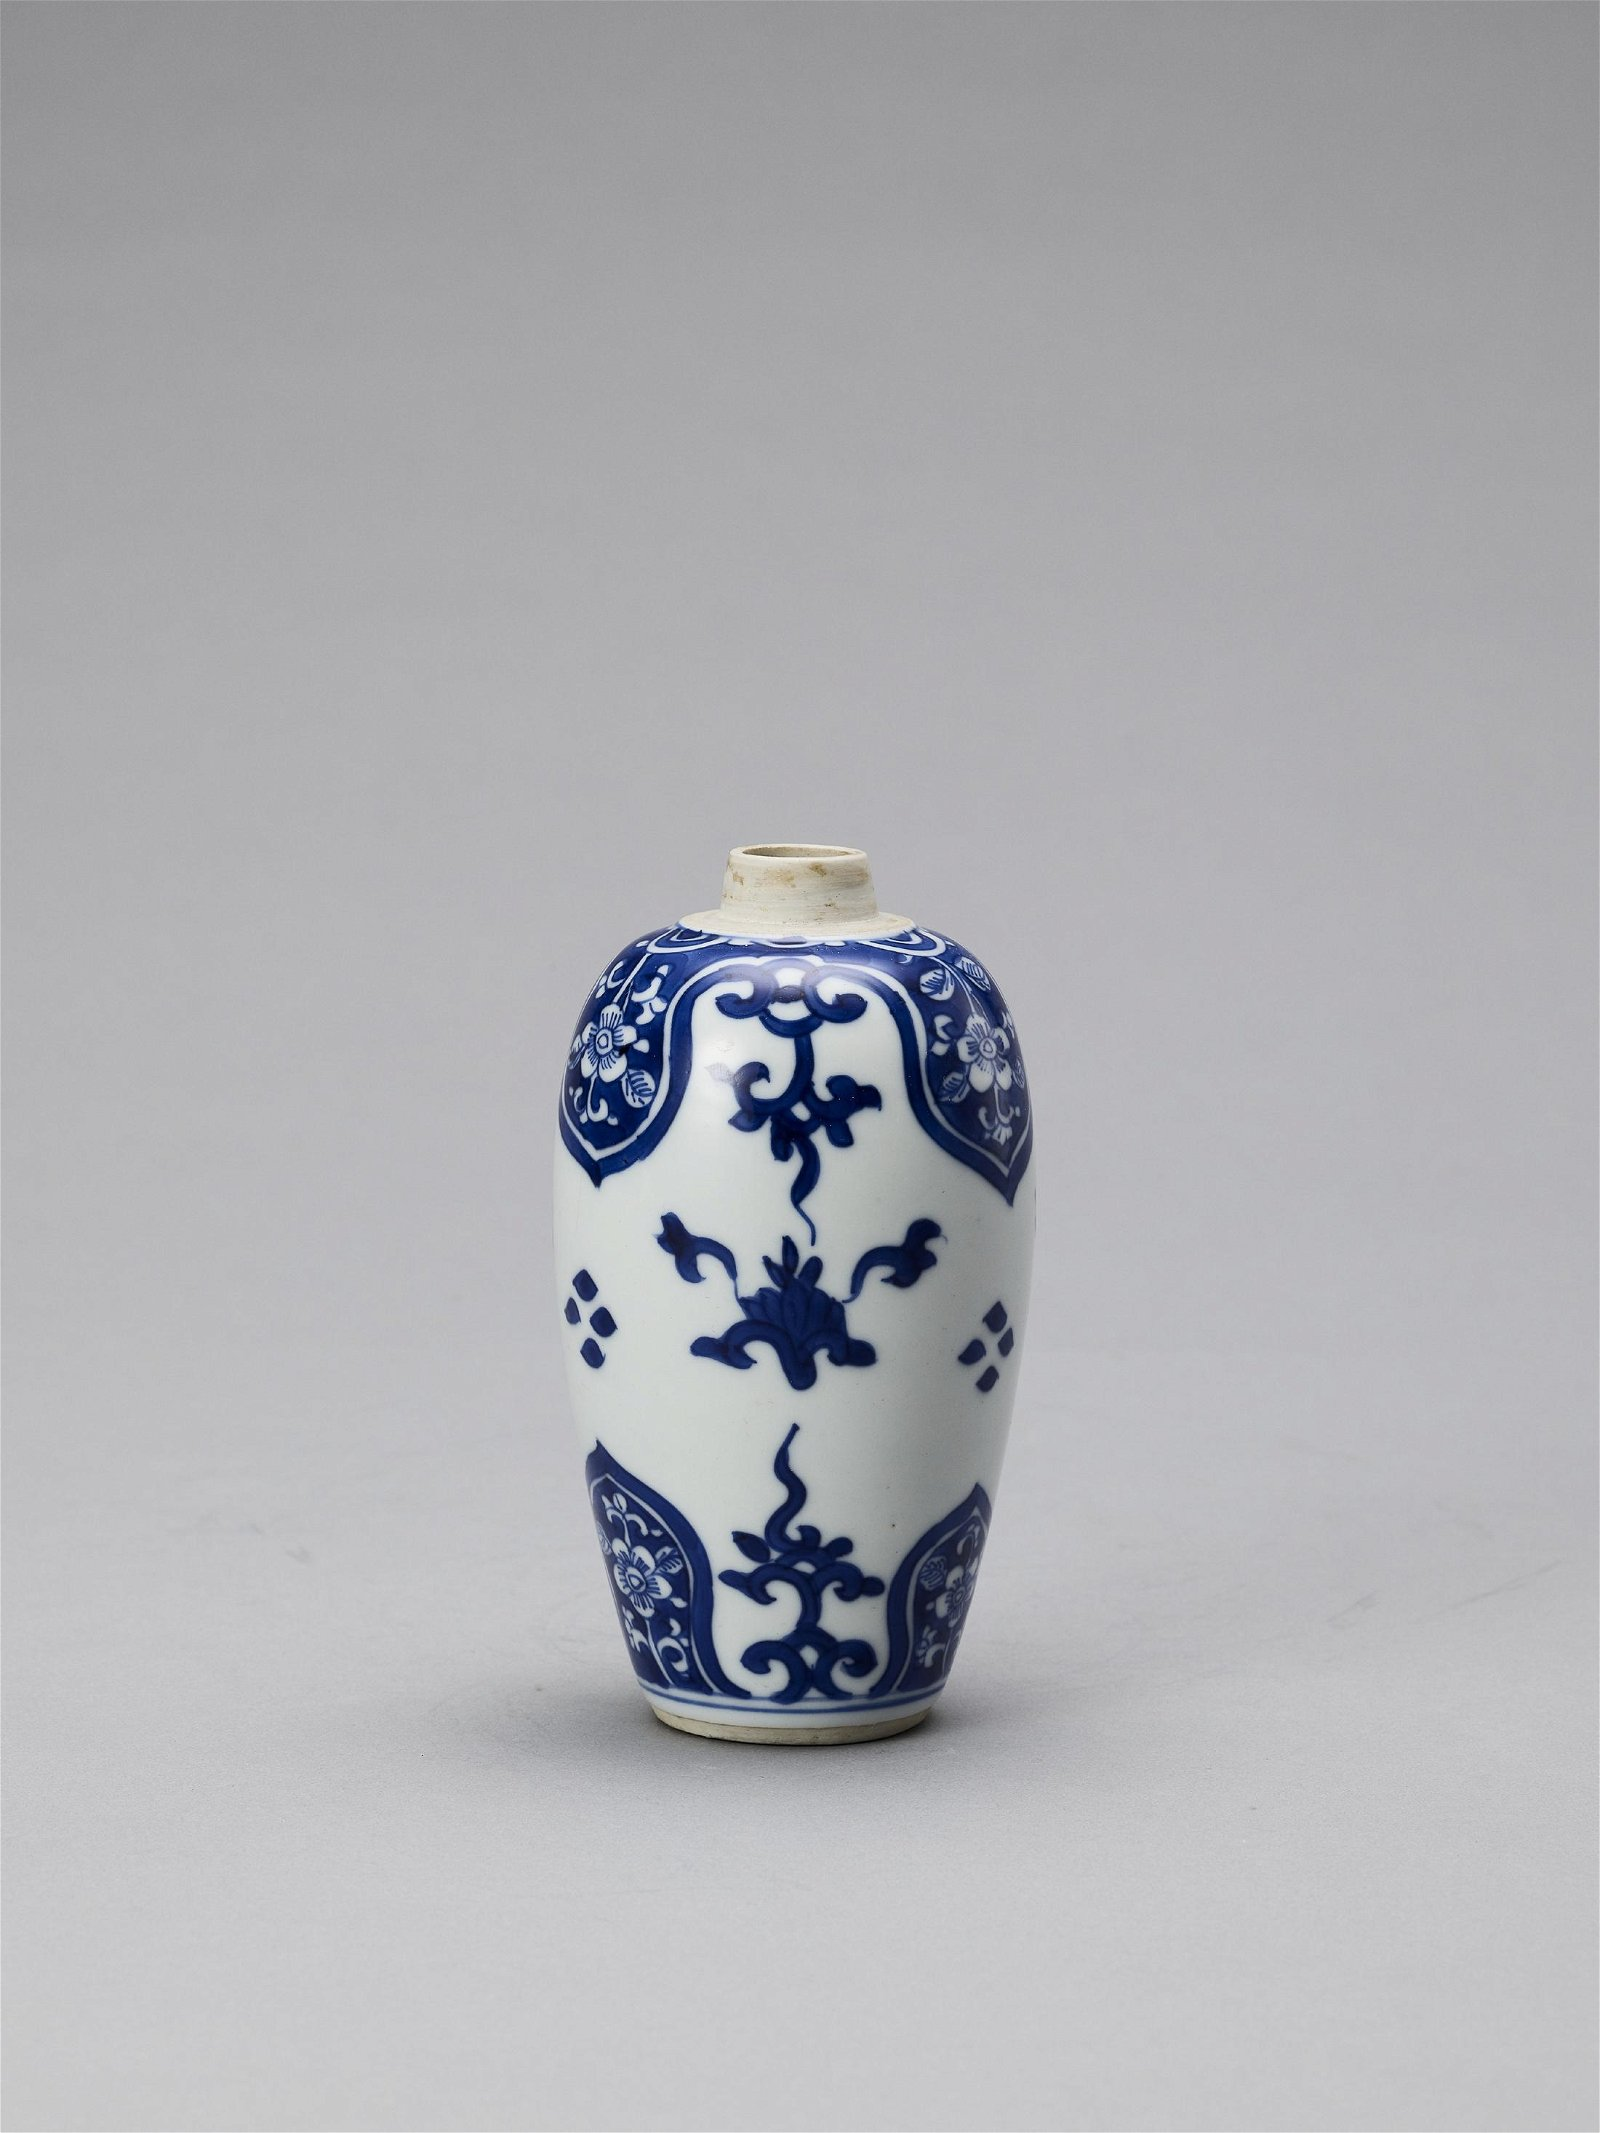 A BLUE AND WHITE PORCELAIN BALUSTER VASE, KANGXI